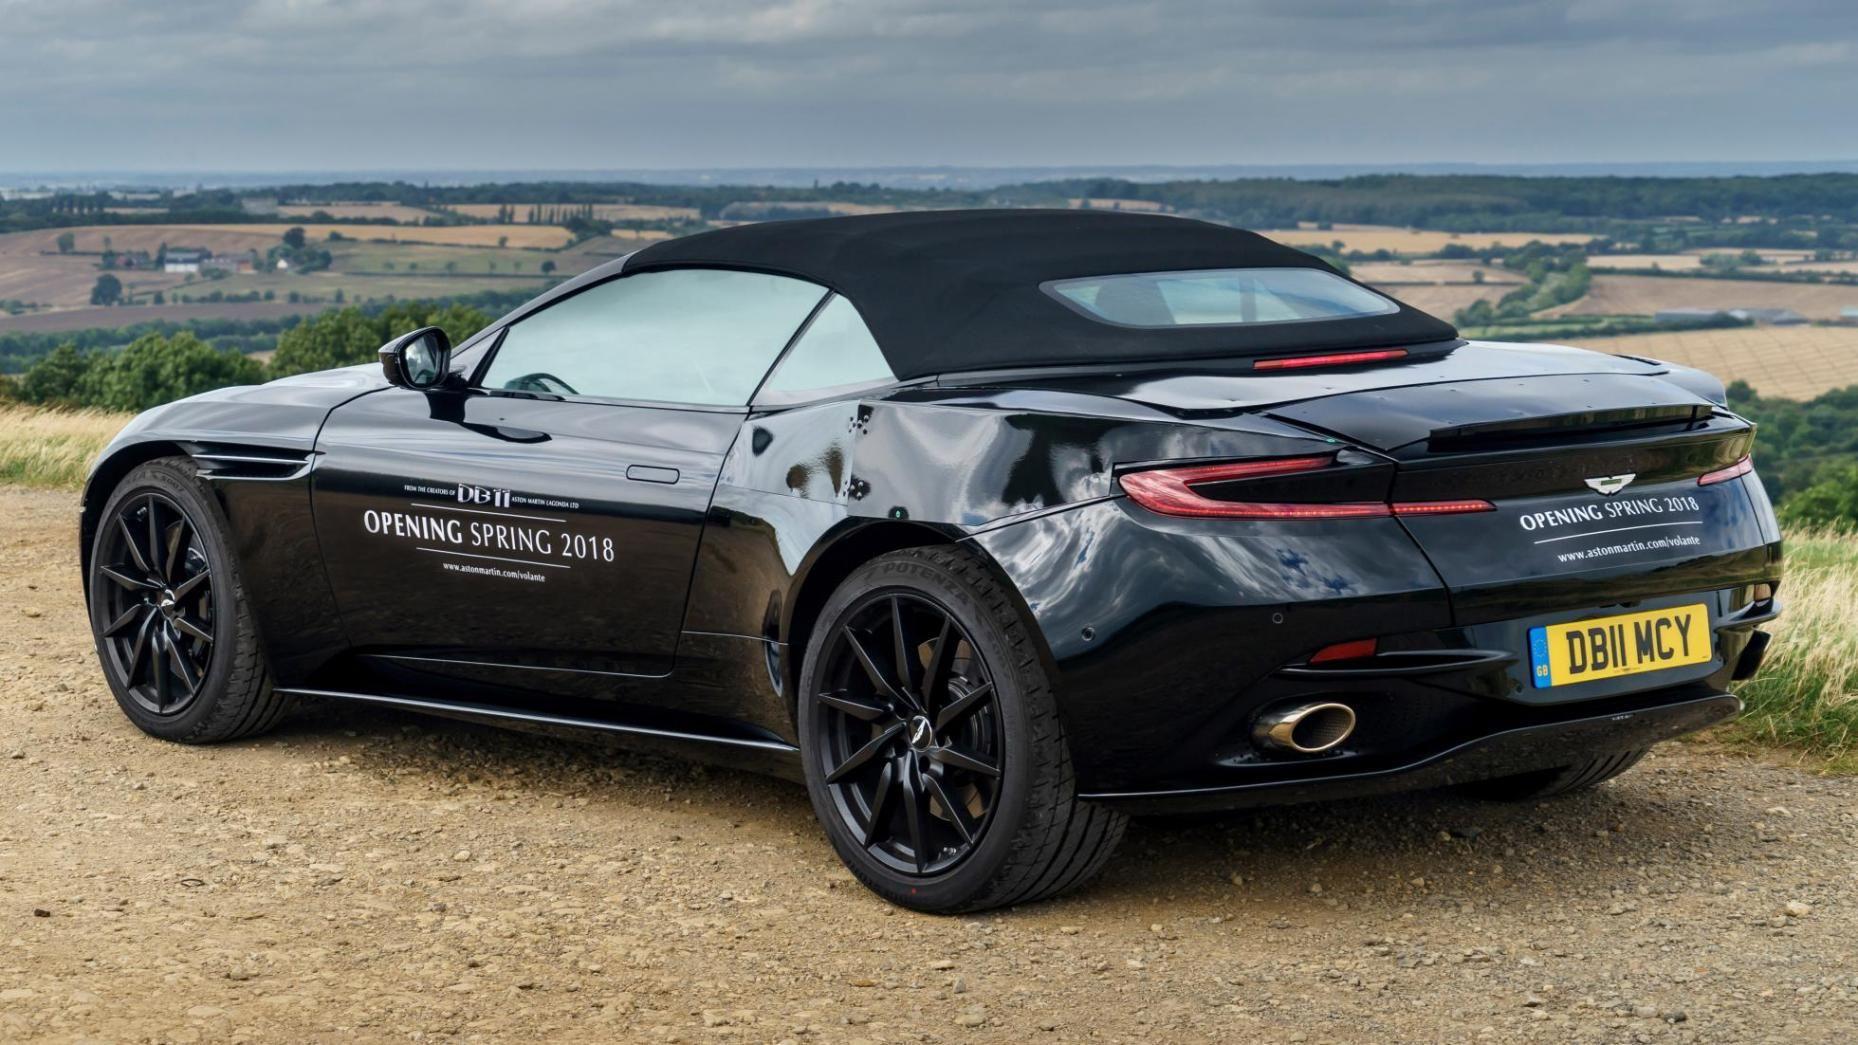 2018 - Aston Martin DB11 Volante   Cars   Pinterest   Aston martin ...